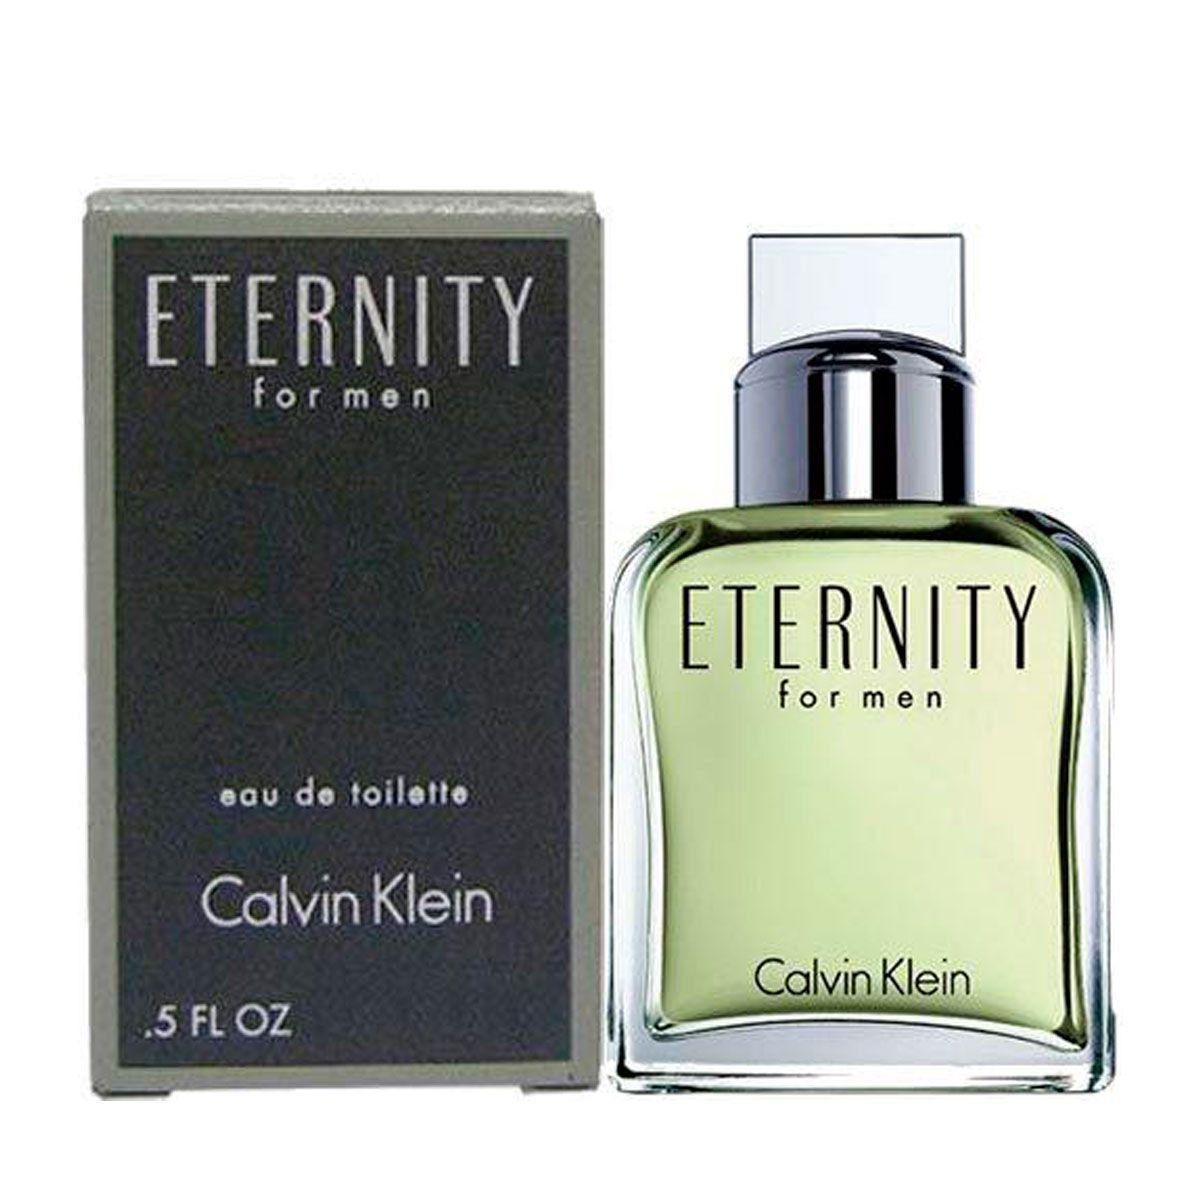 bff8a7c32ea52 Perfume Calvin Klein Eternity For Men Masculino Edt 100ml - Boutique ...